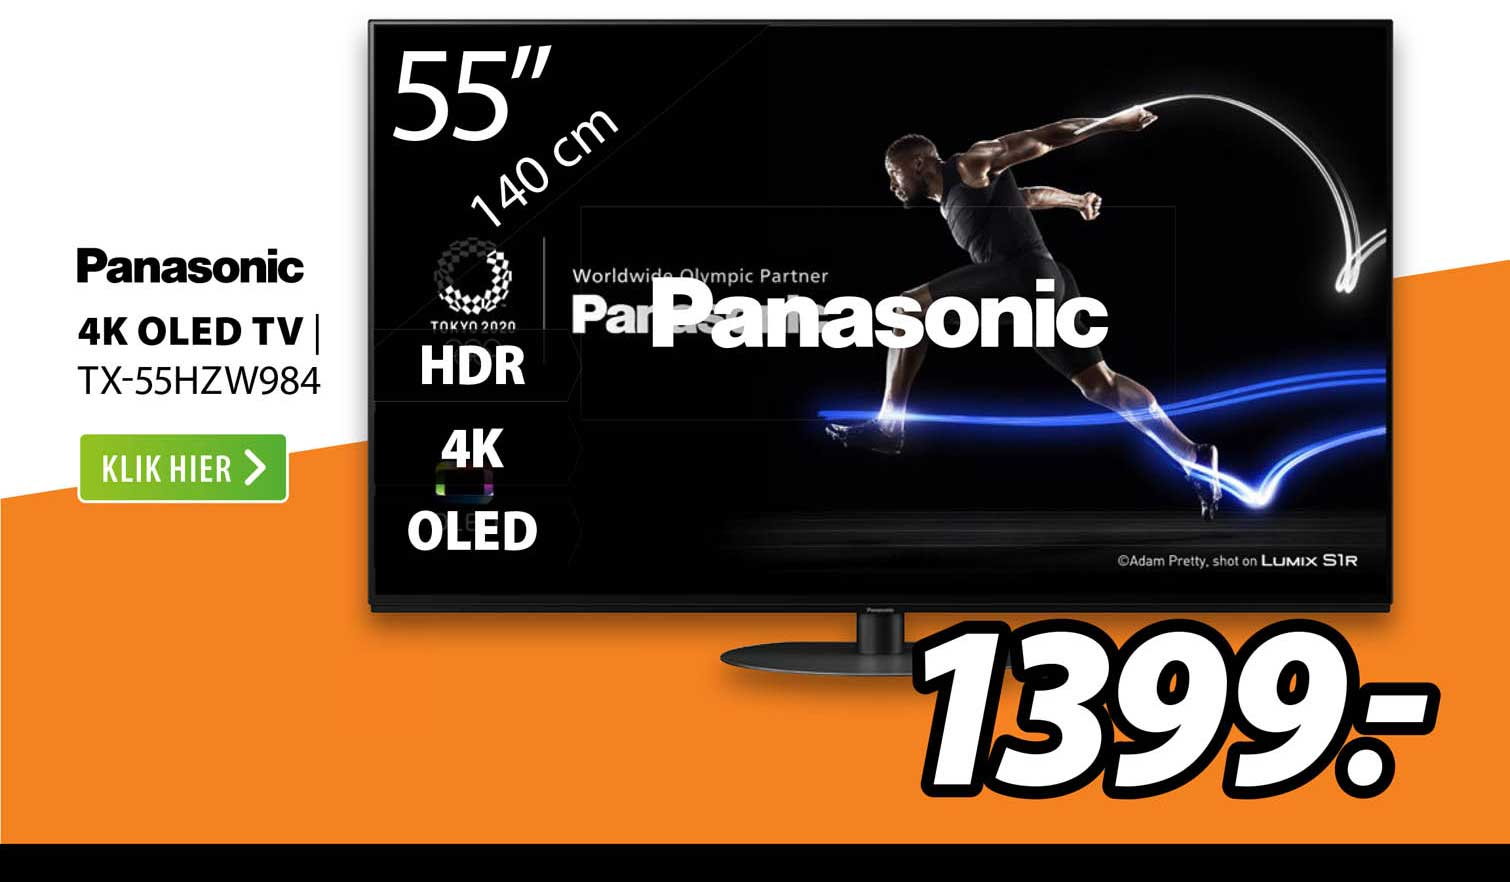 Expert Panasonic 4K OLED TV | TX-55HZW984